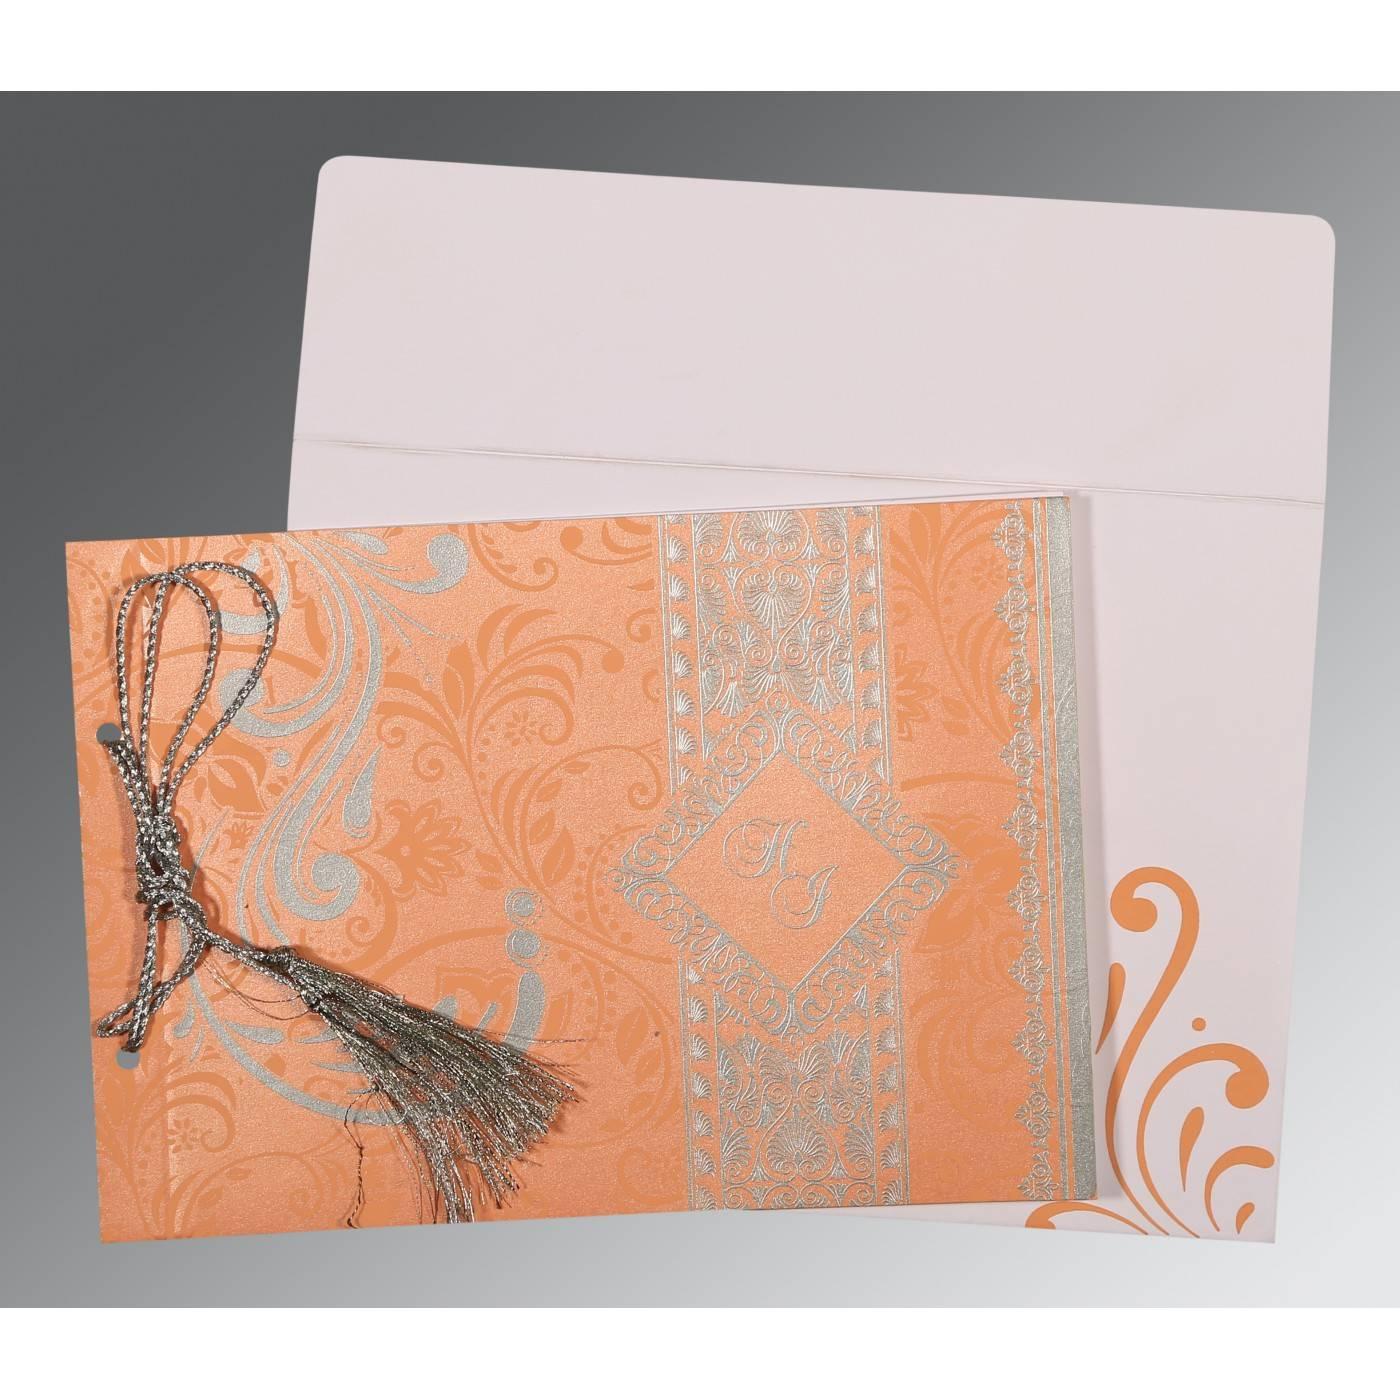 SWEET NECTAR SHIMMERY SCREEN PRINTED WEDDING CARD : CG-8223N - IndianWeddingCards